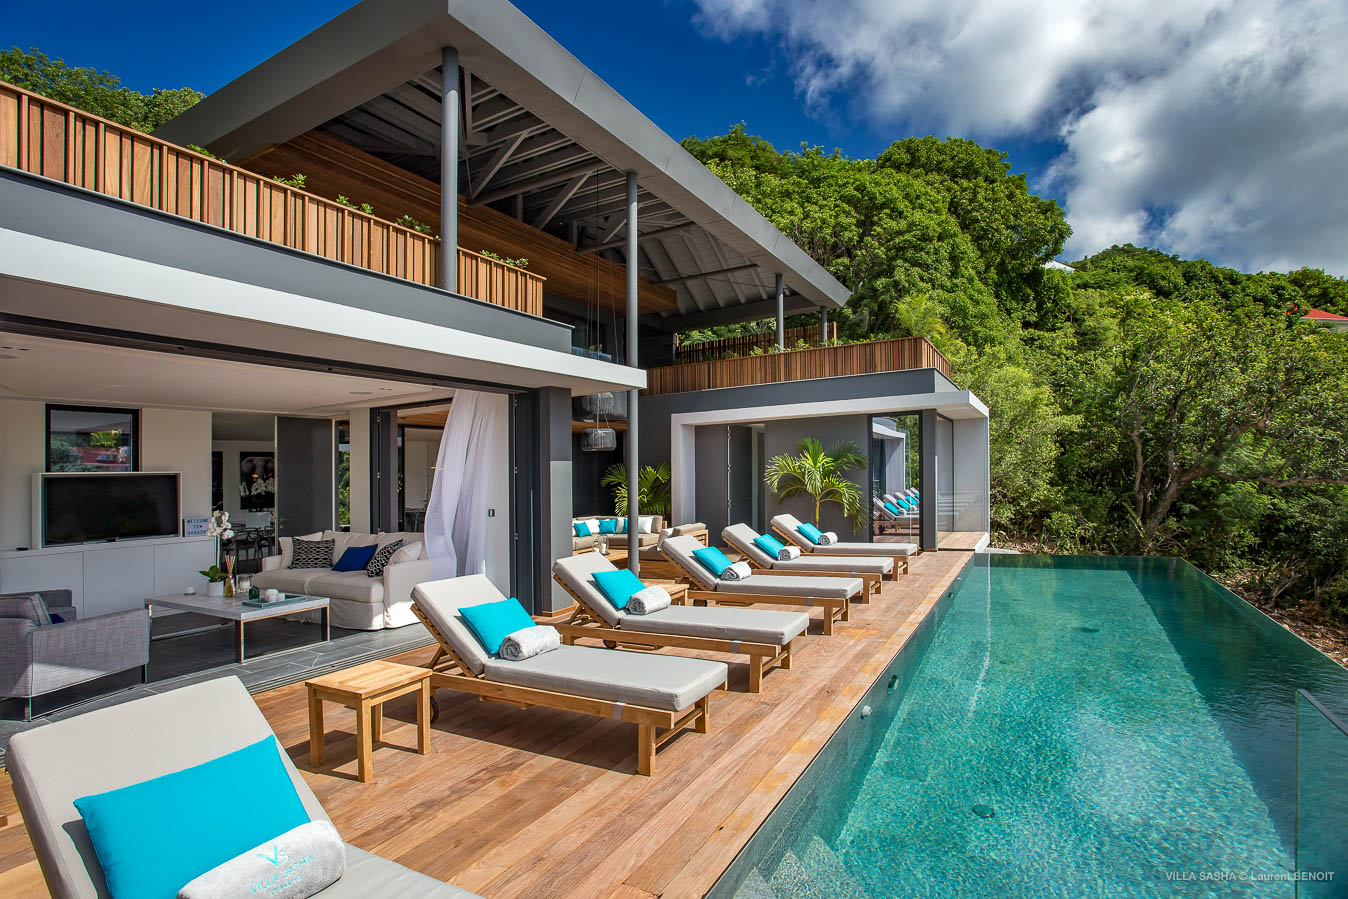 Villa Sasha - Villa for Rent with Heated Pool Corossol - Outside View